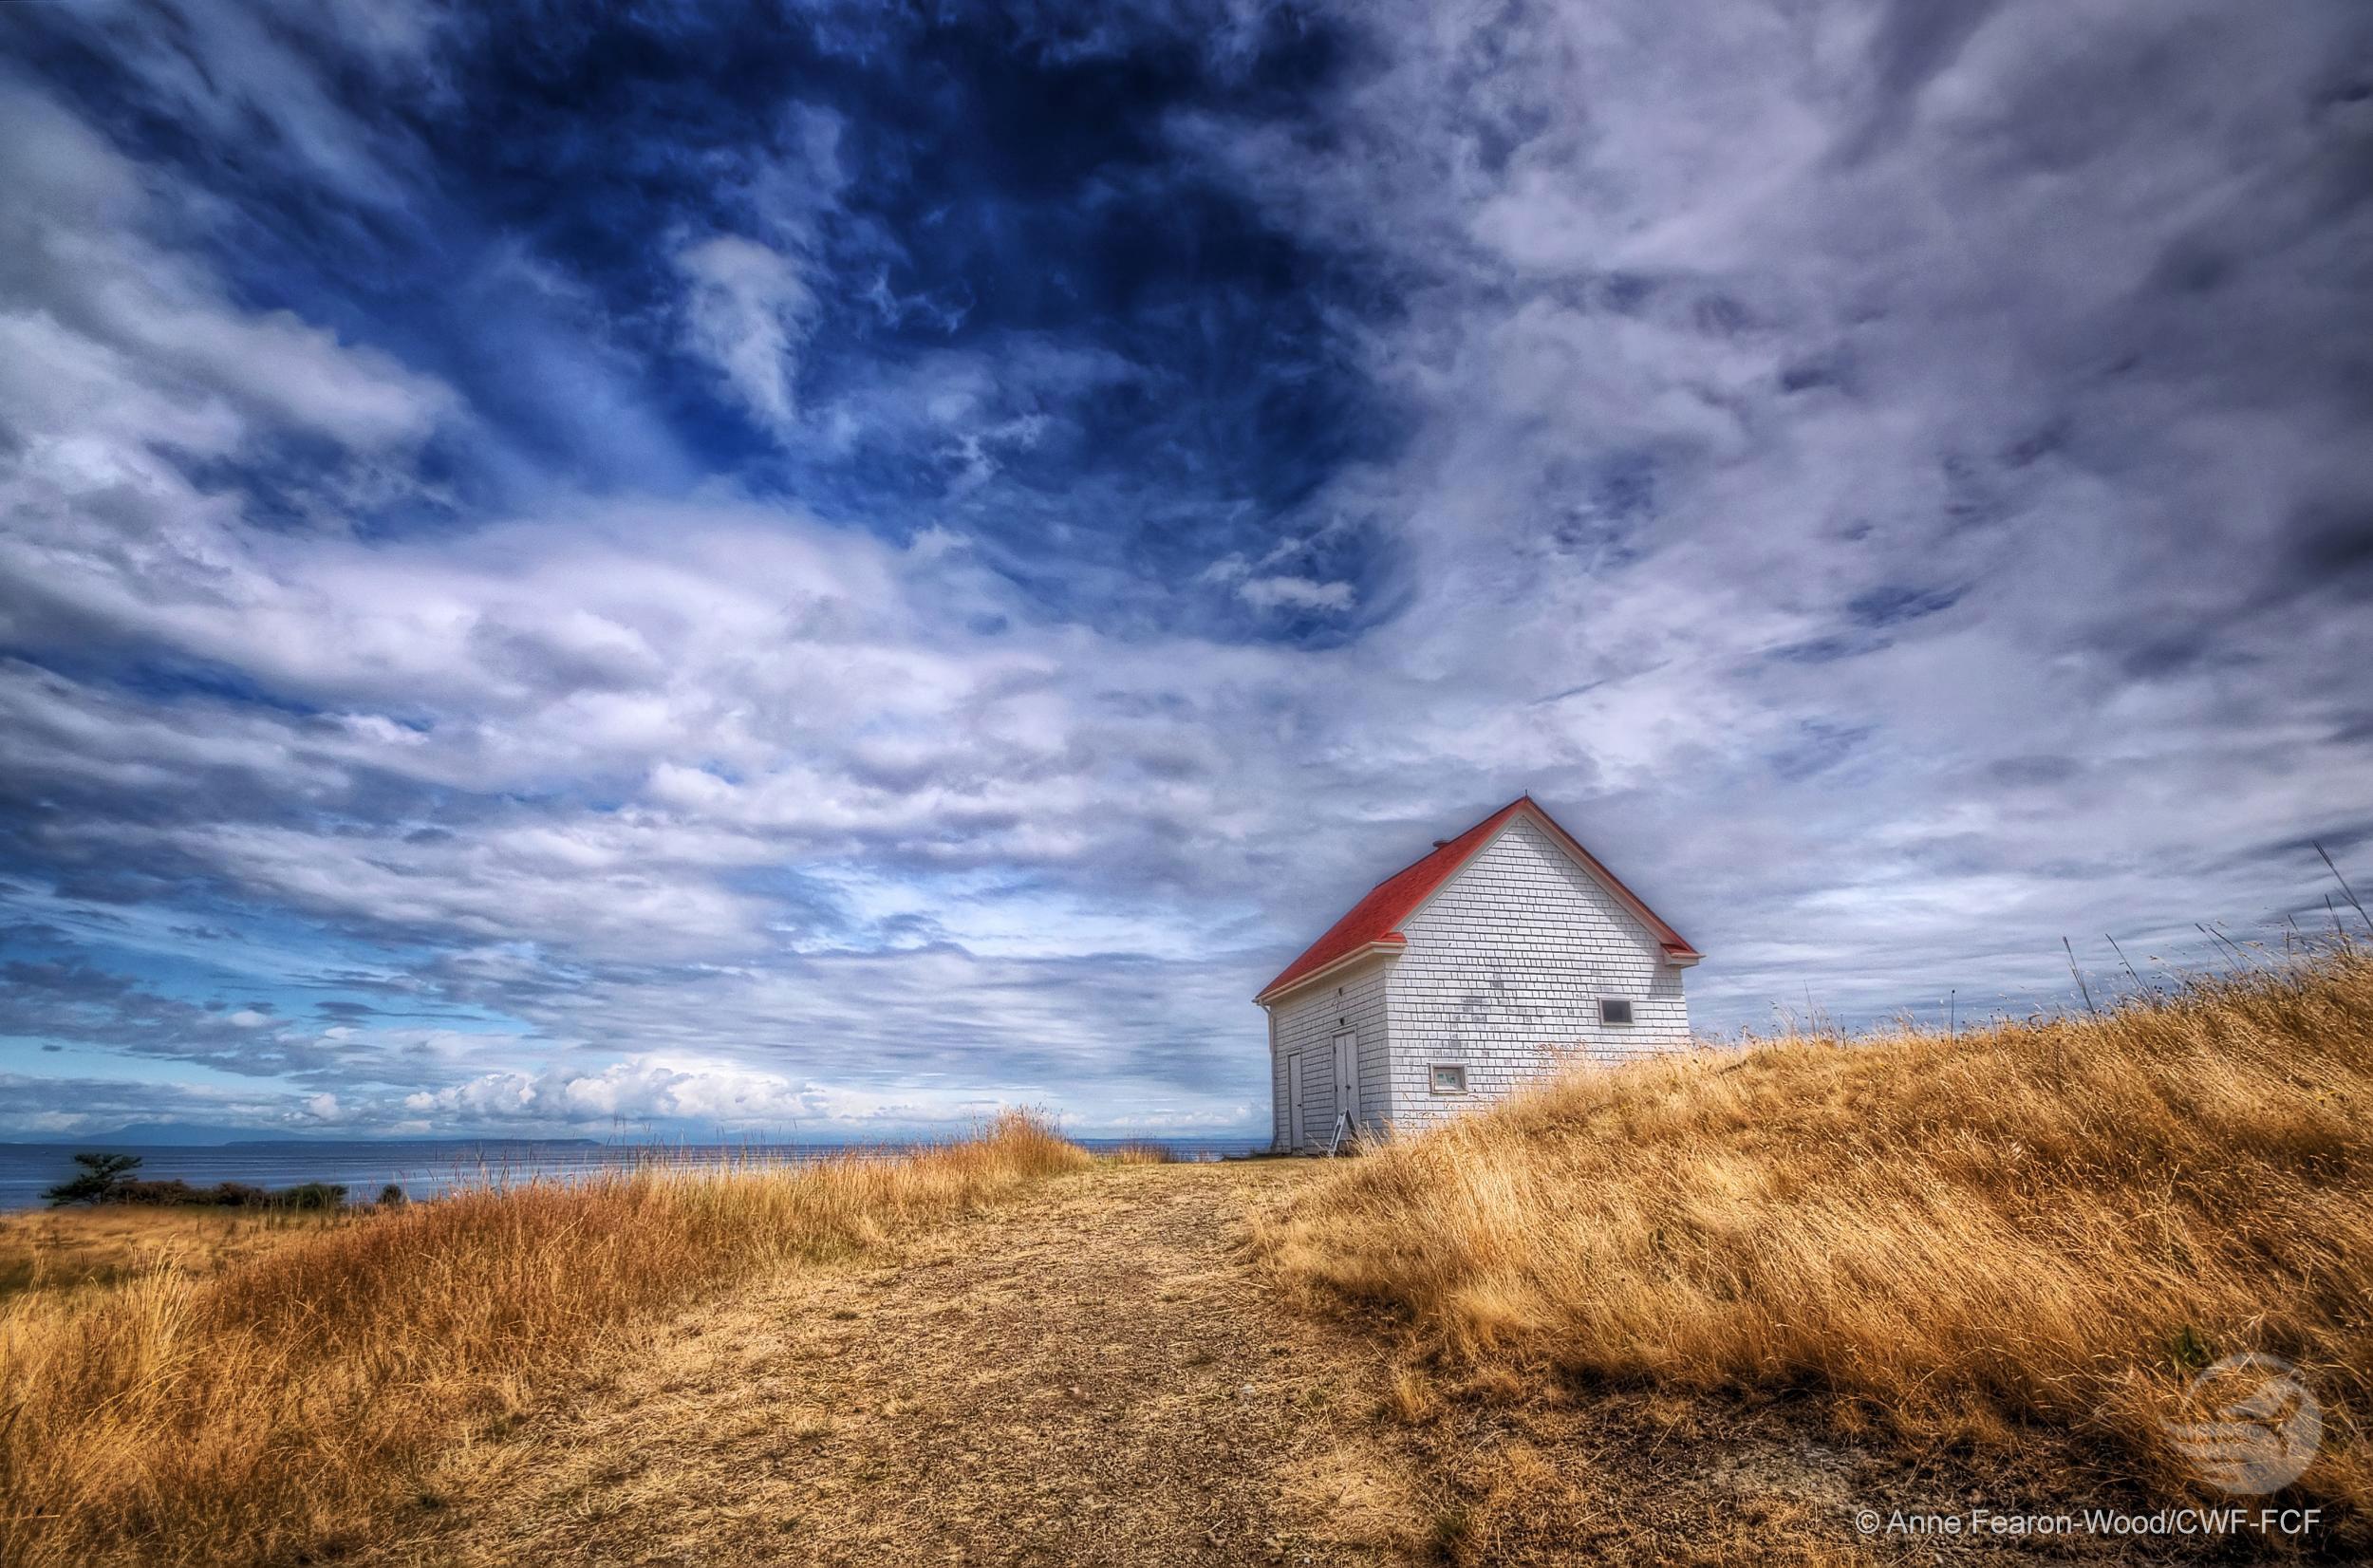 Saturna Island, BC